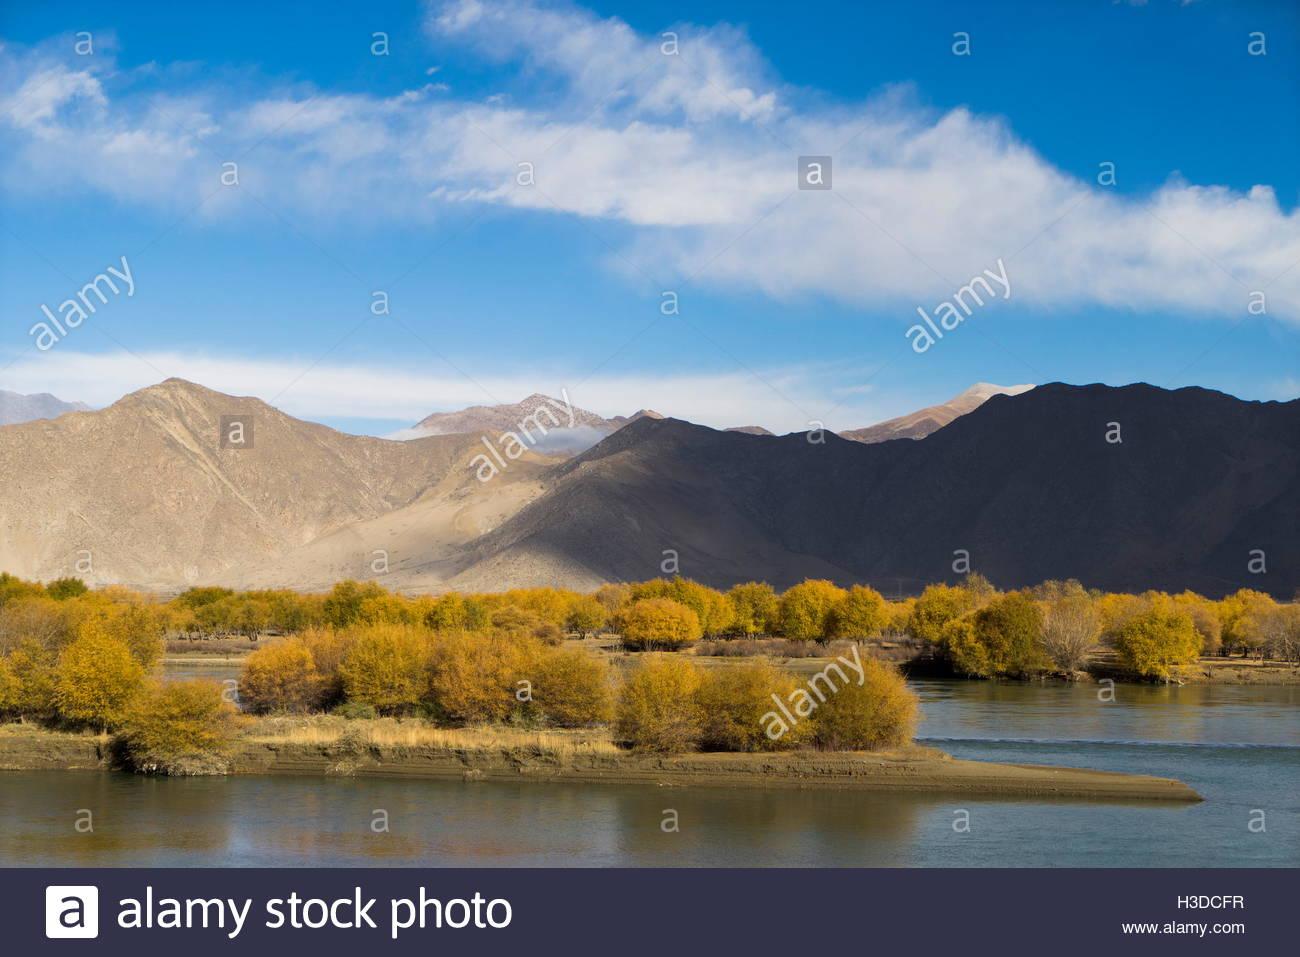 Mountains between Lhasa and Gyantse. - Stock Image